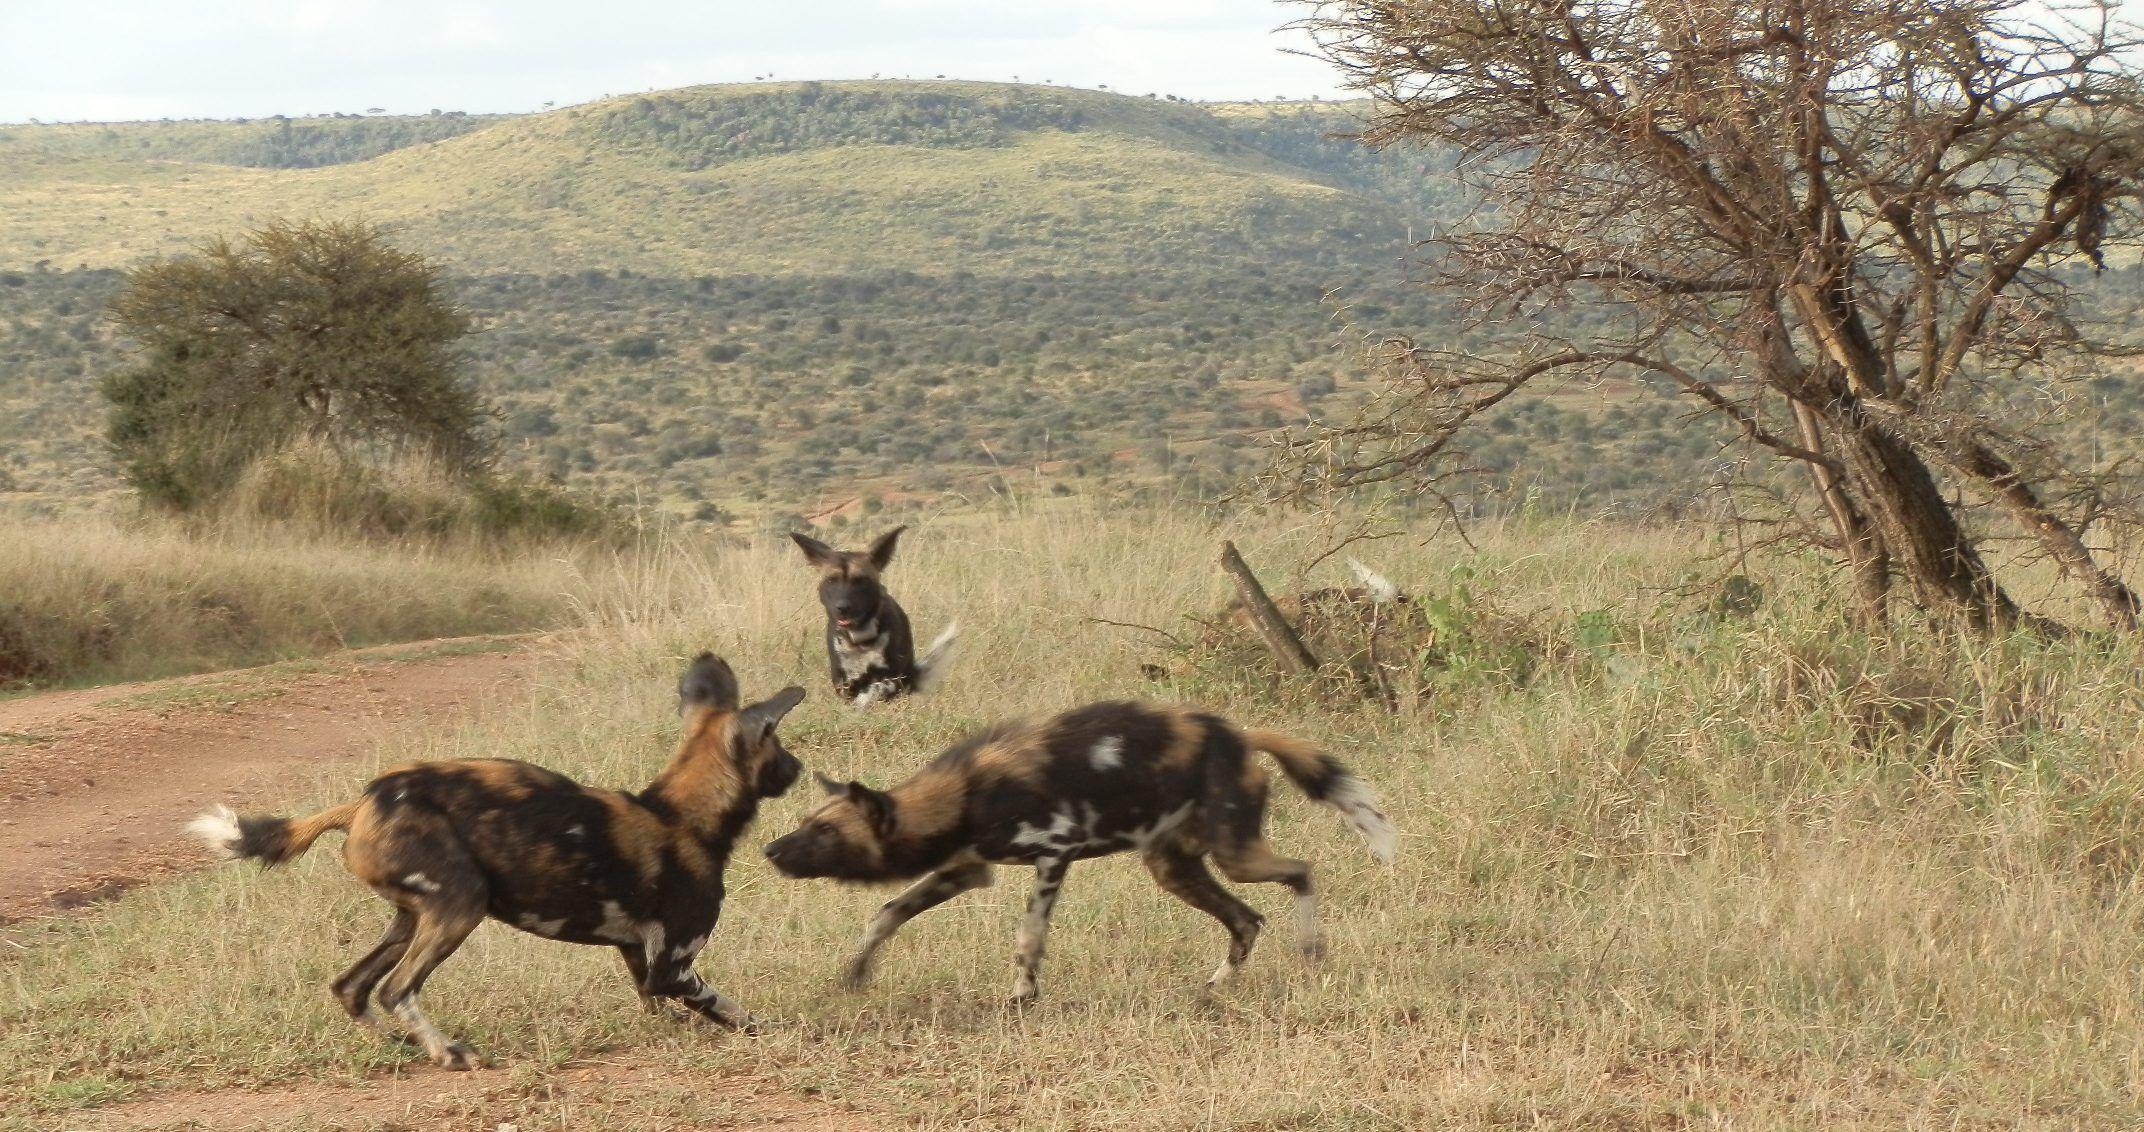 Wild dog asserting authority - 26.8.12.  At Loisaba Wilderness, Laikipia, Kenya.  www.loisaba.com